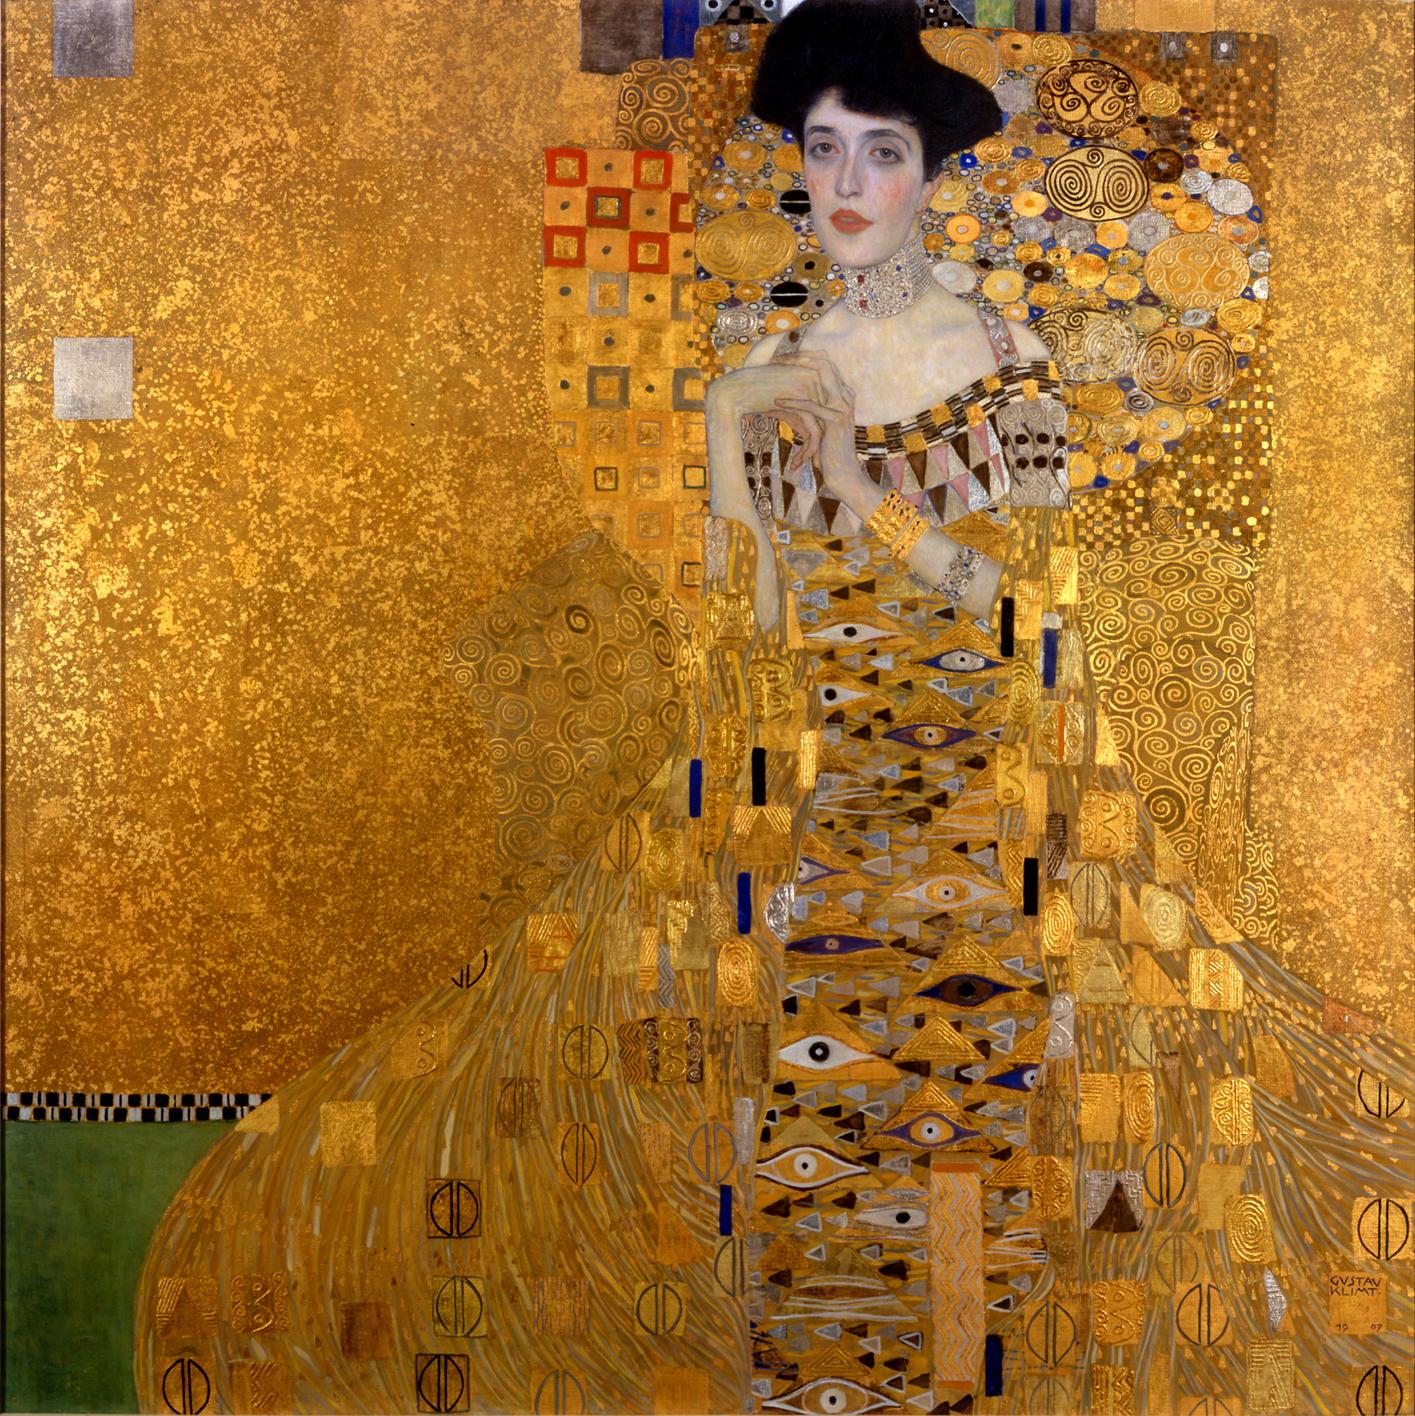 Protrait of Adele Bloch-Bauer I (1907) by Gustav Klimt.